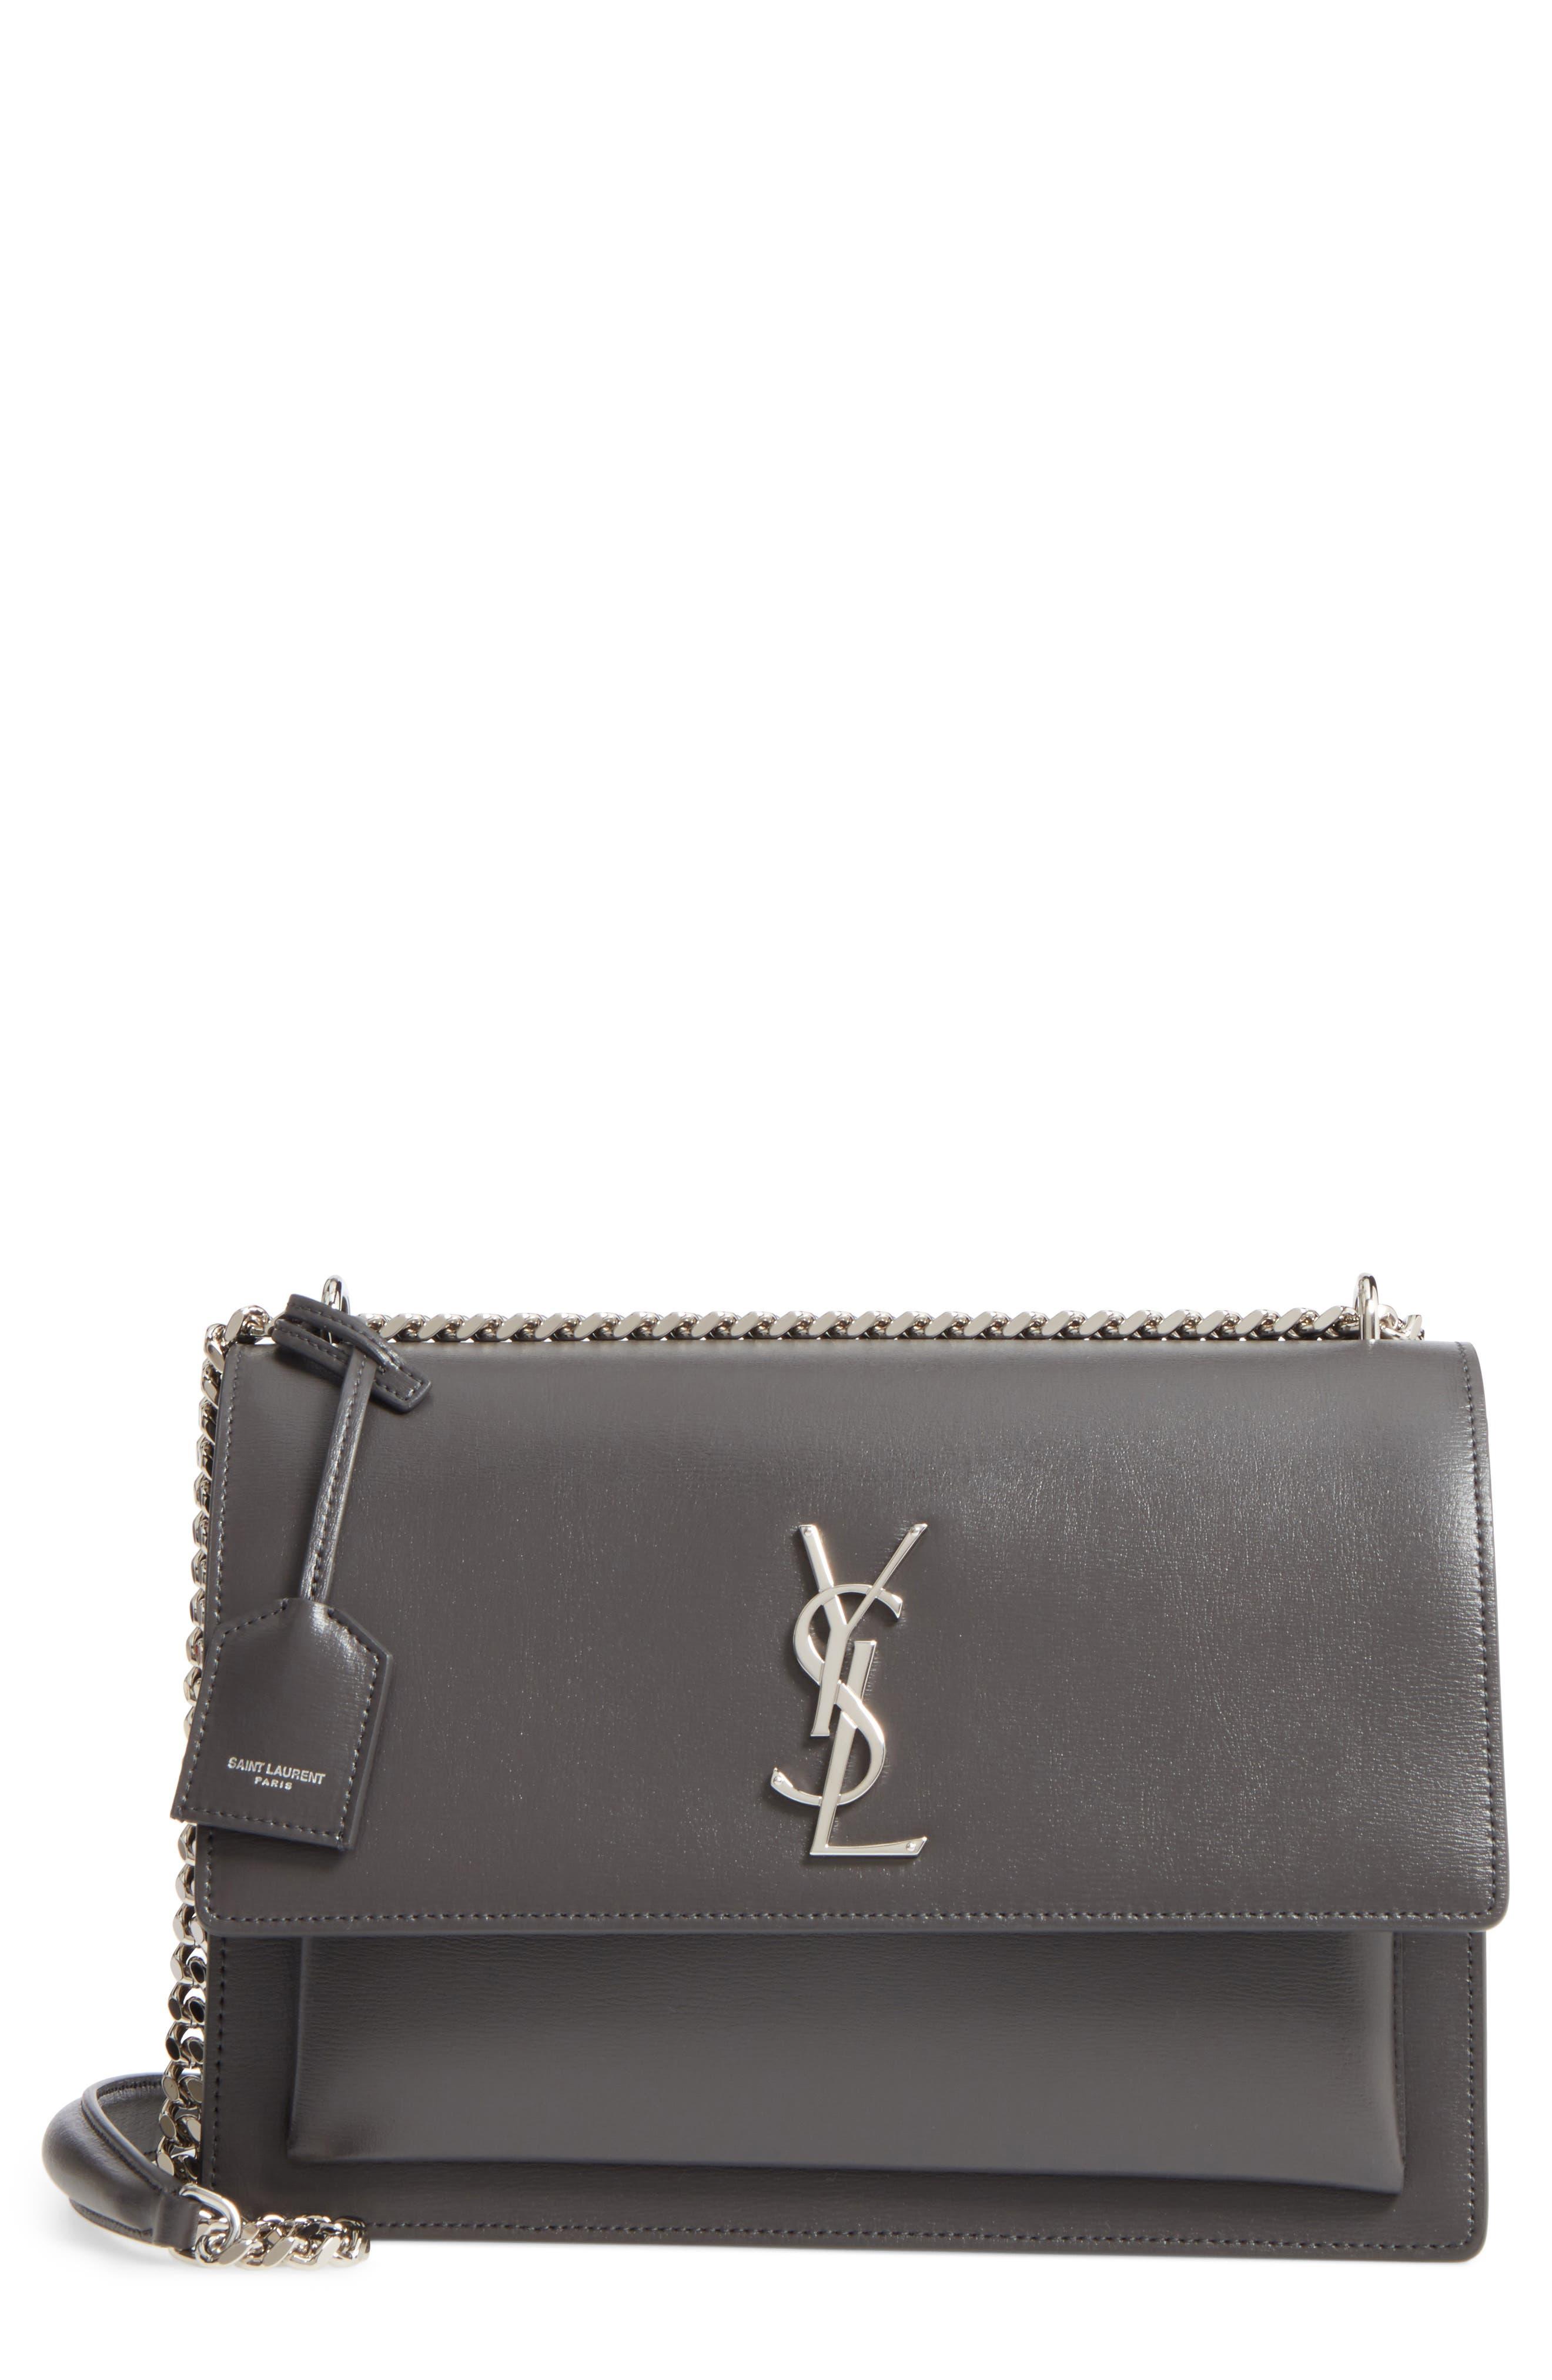 Saint Laurent Medium Sunset Leather Shoulder Bag